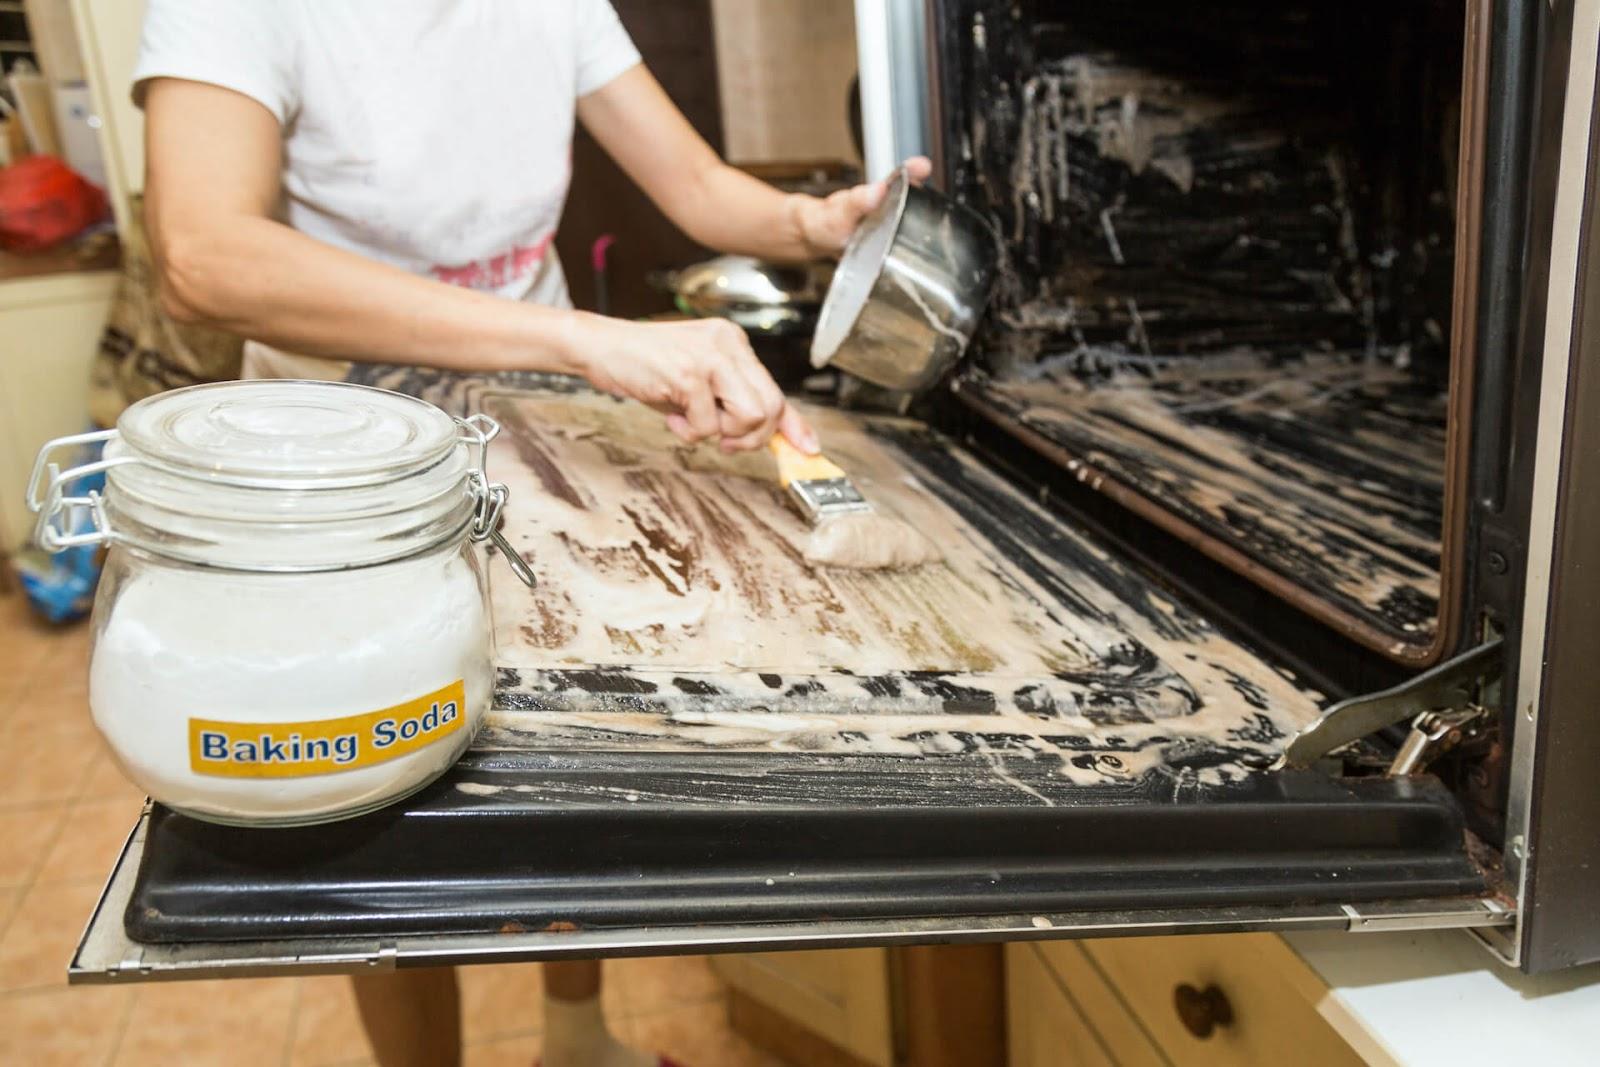 Woman scrubbing baking soda on her oven